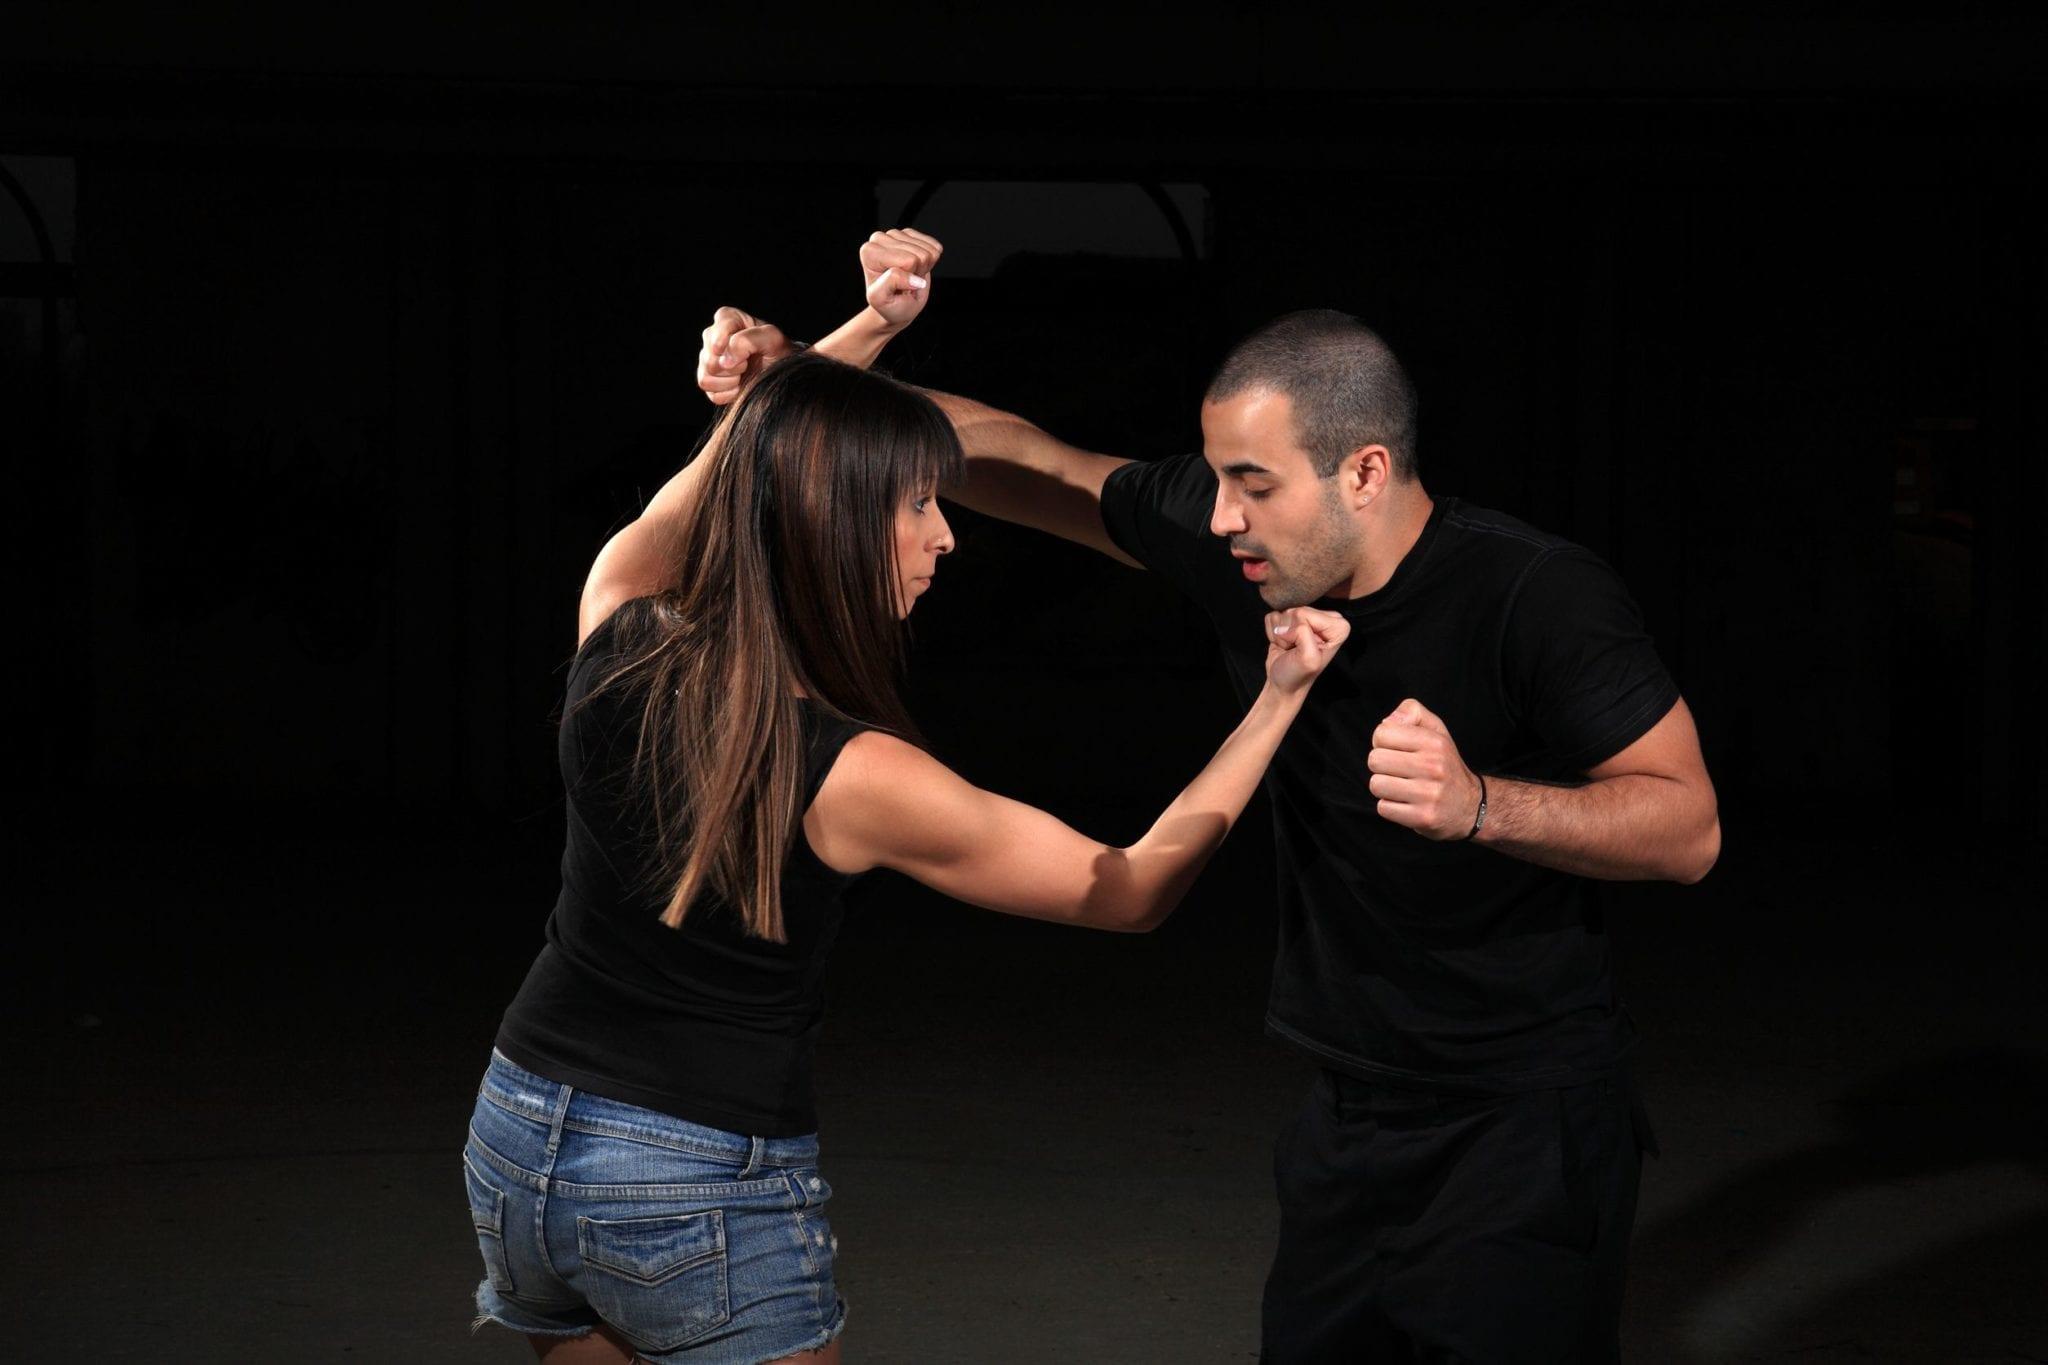 Self Defense Domestic Violence Texas